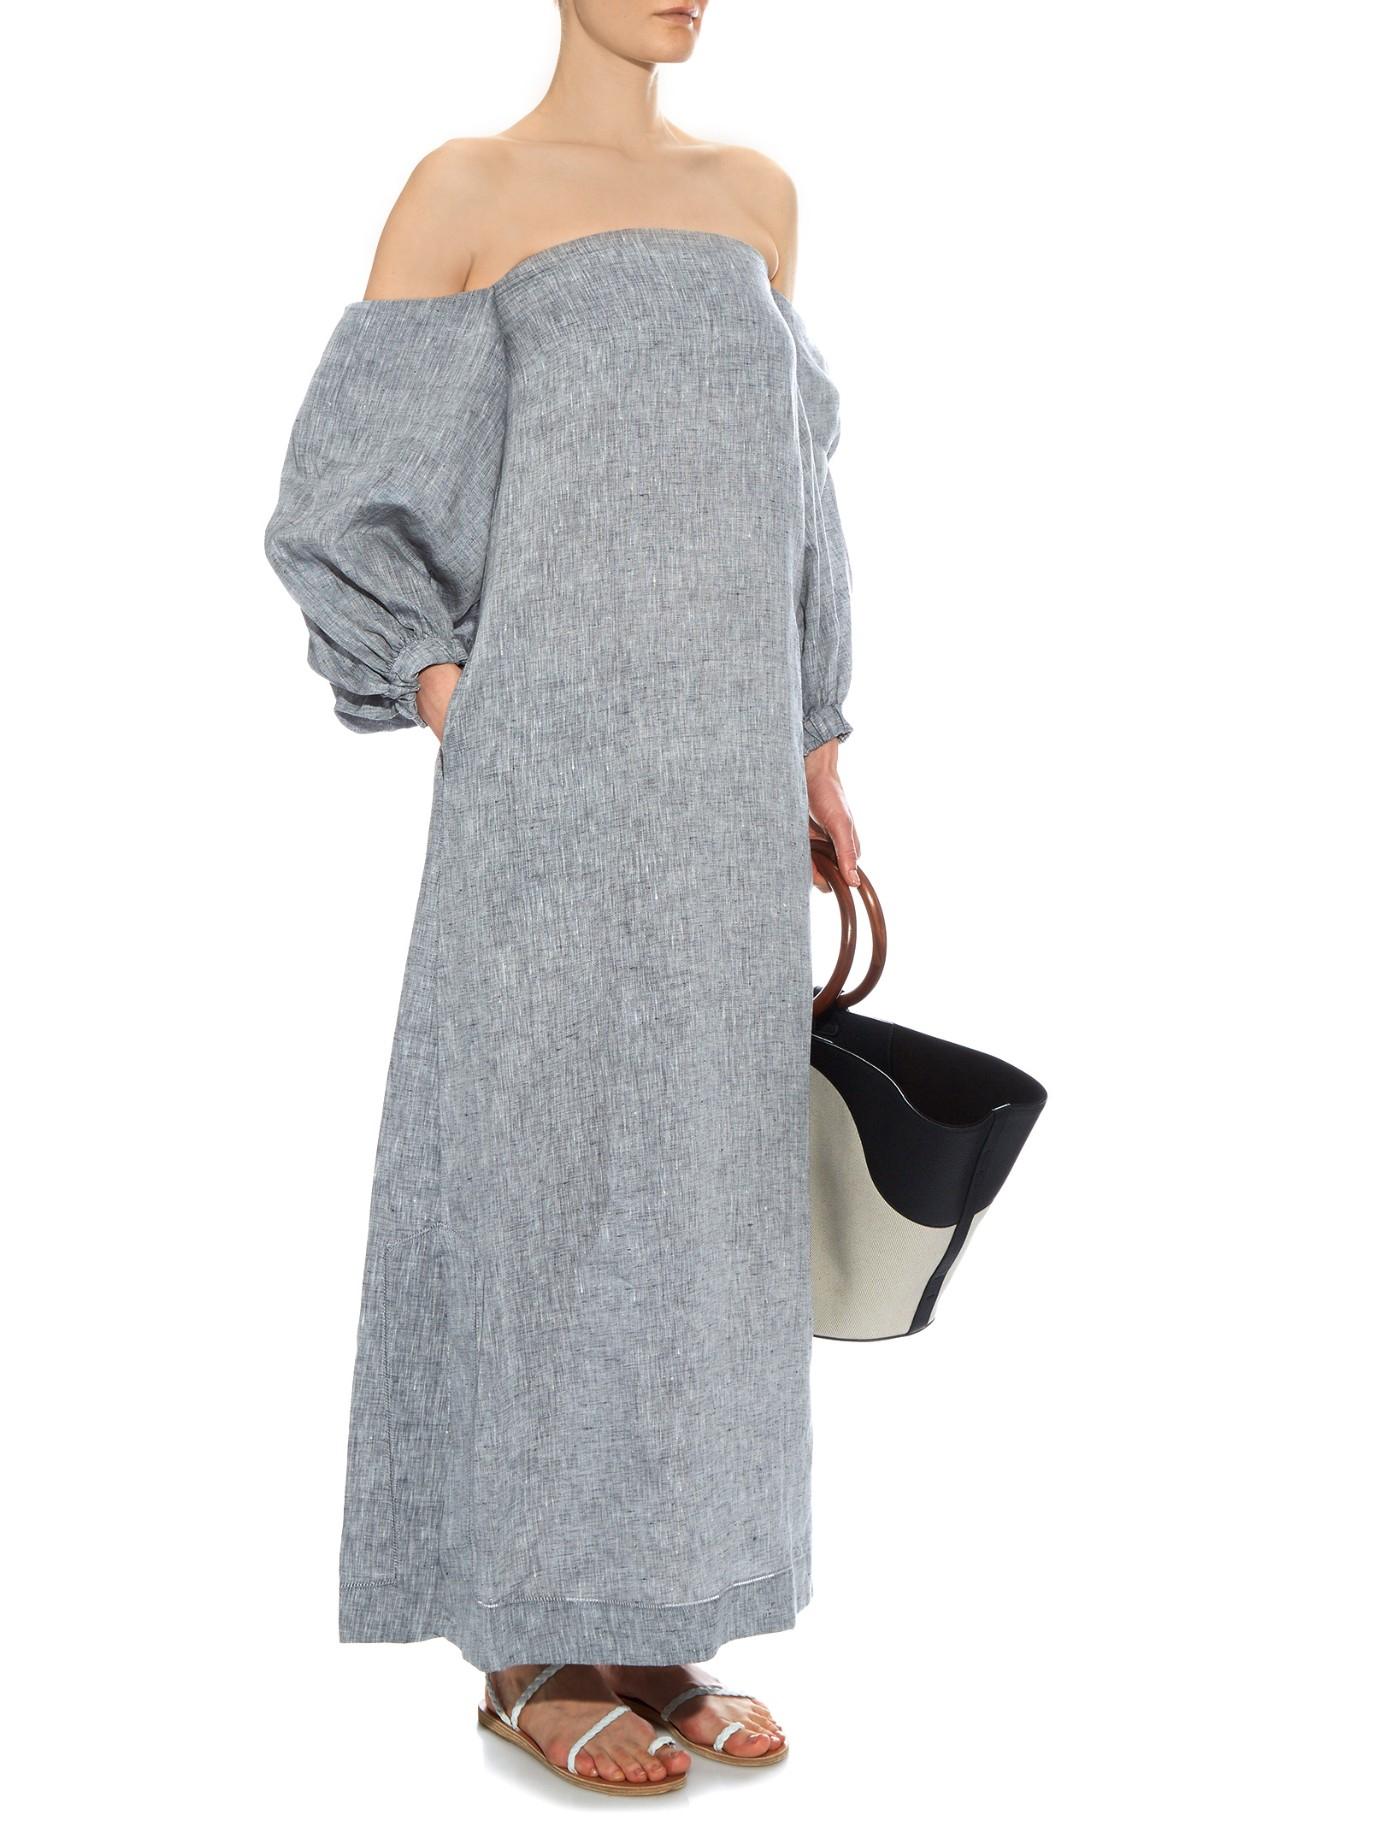 Arden off-the-shoulder linen dress Lisa Marie Fernandez gkvejc